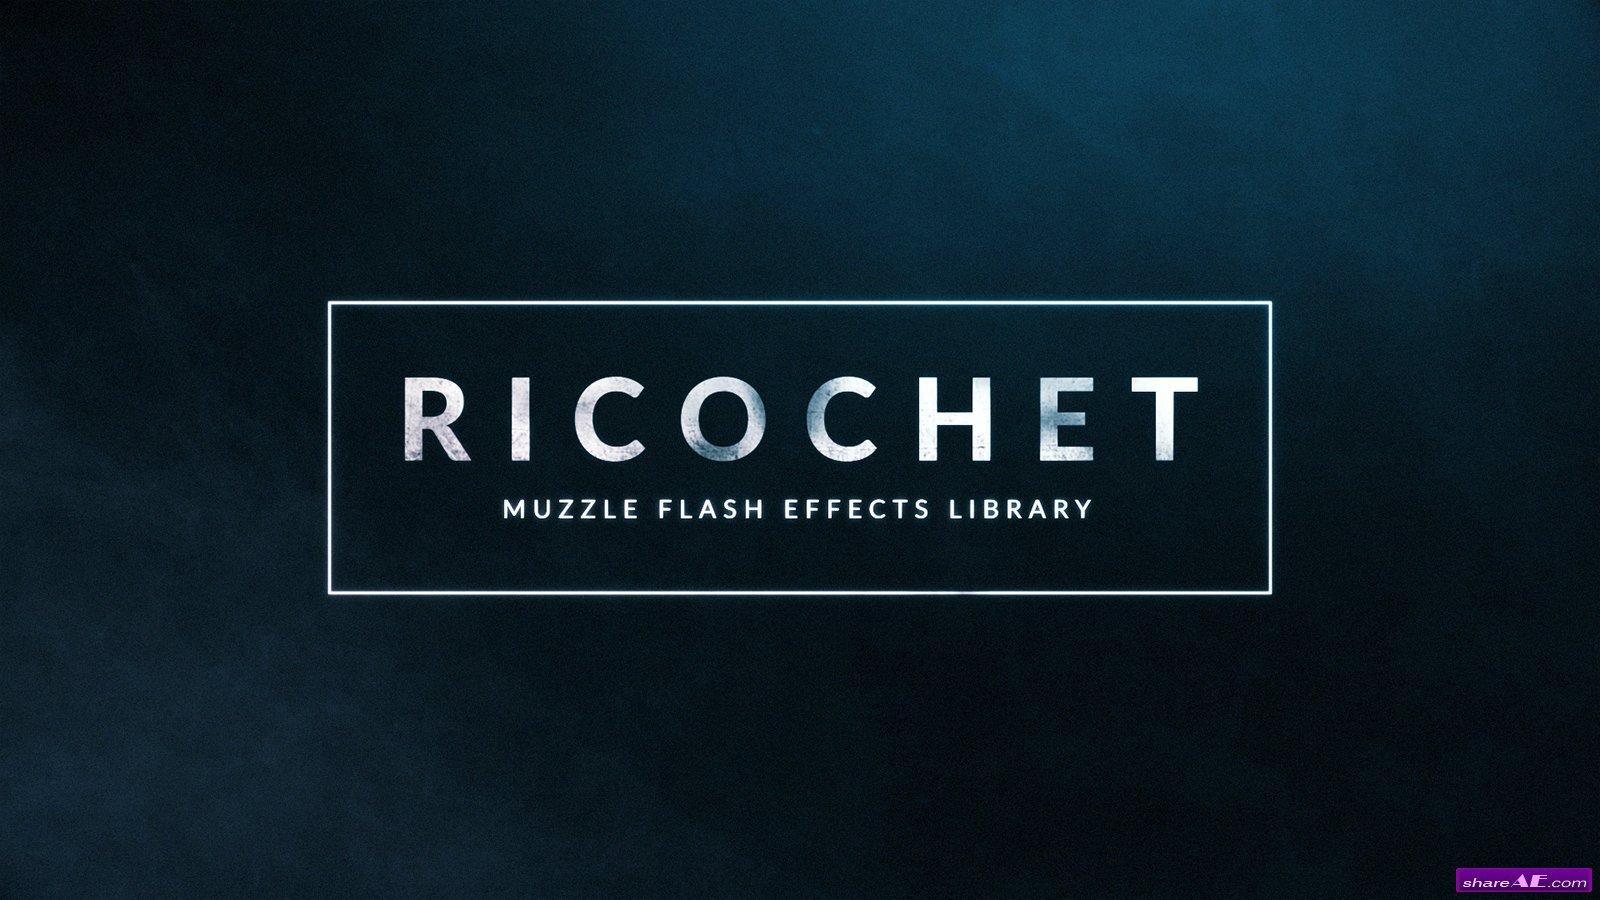 Ricochet - 450+ Muzzle Flash & Gun Smoke Effects - After Effects Template (RocketStock)